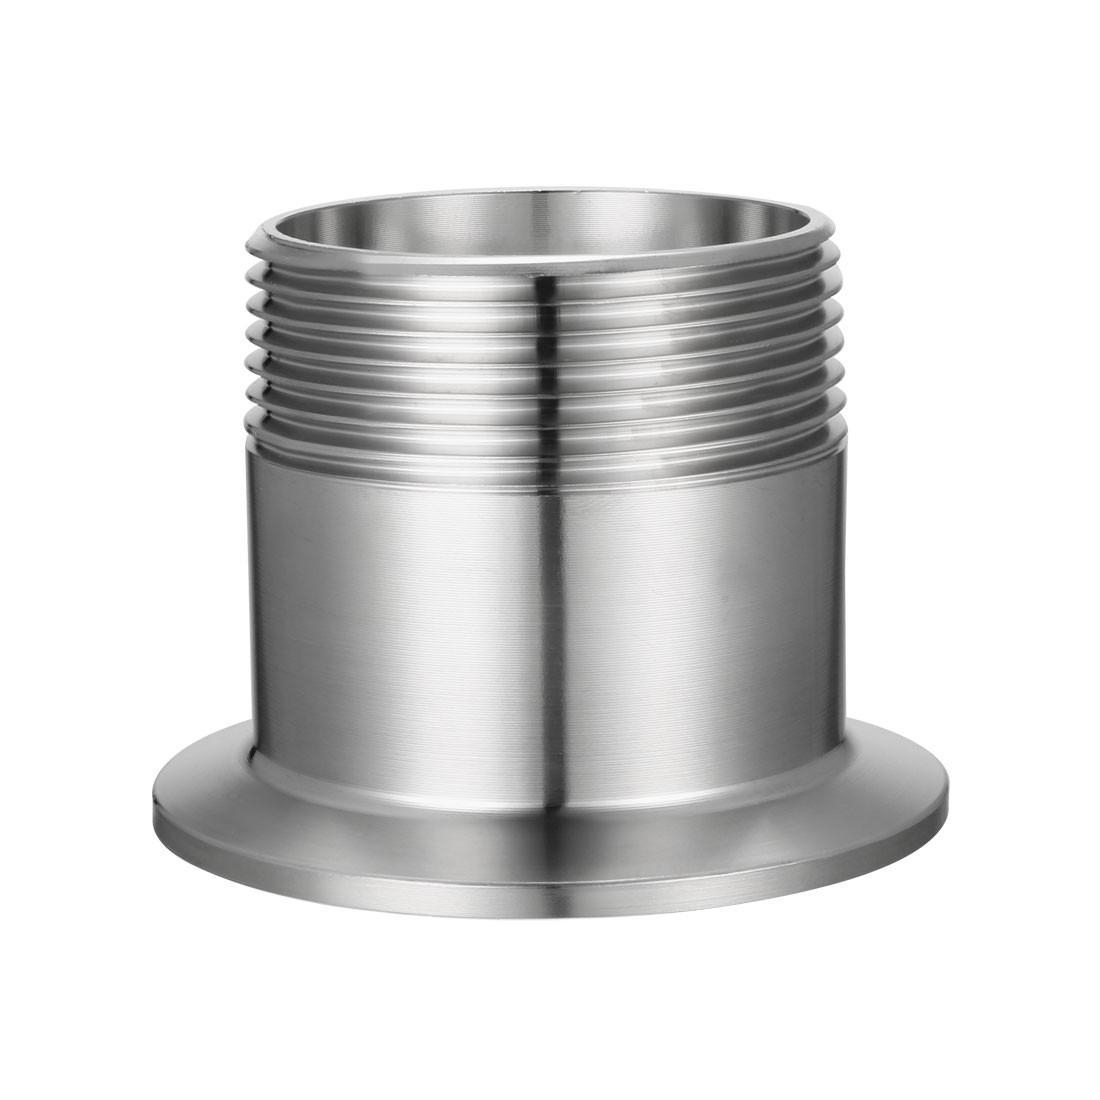 "2"" Tri-Clamp x 1-1/2 "" Male Thread Adapter"